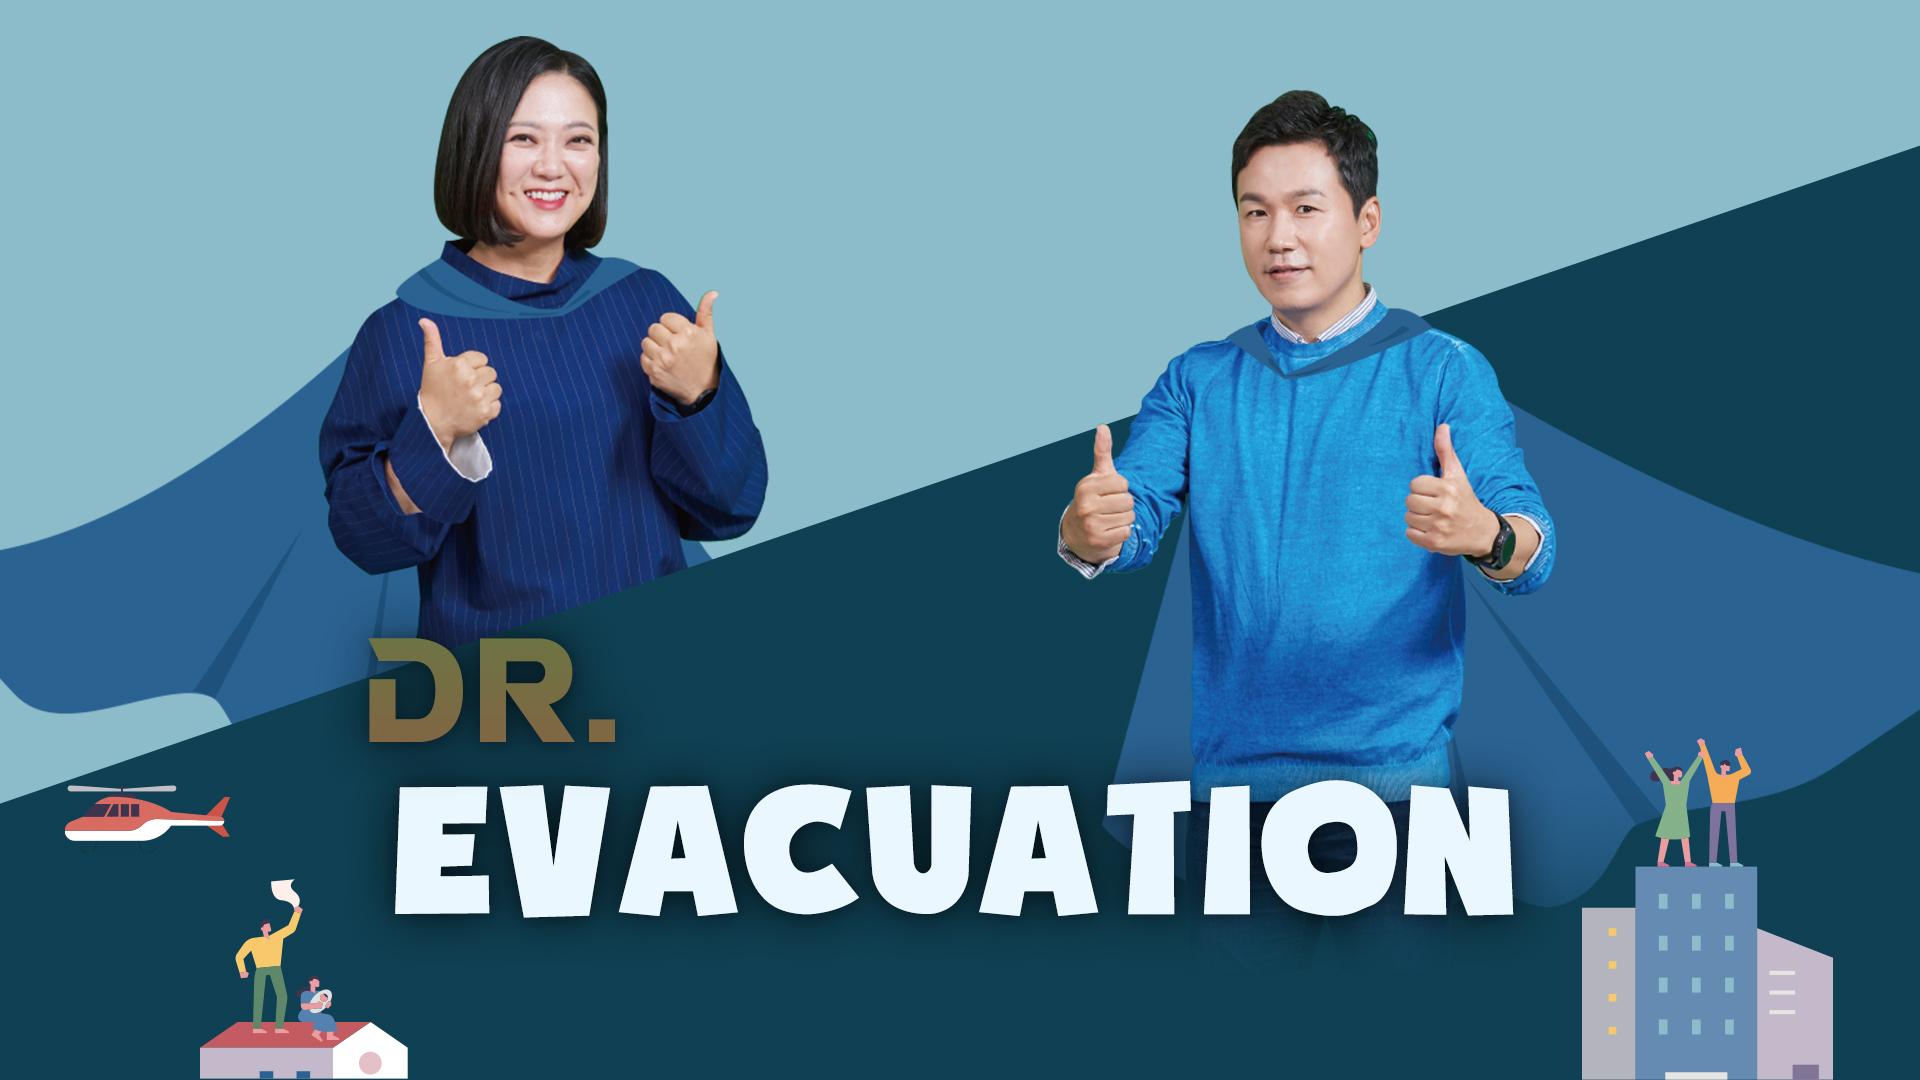 Dr. Evacuation